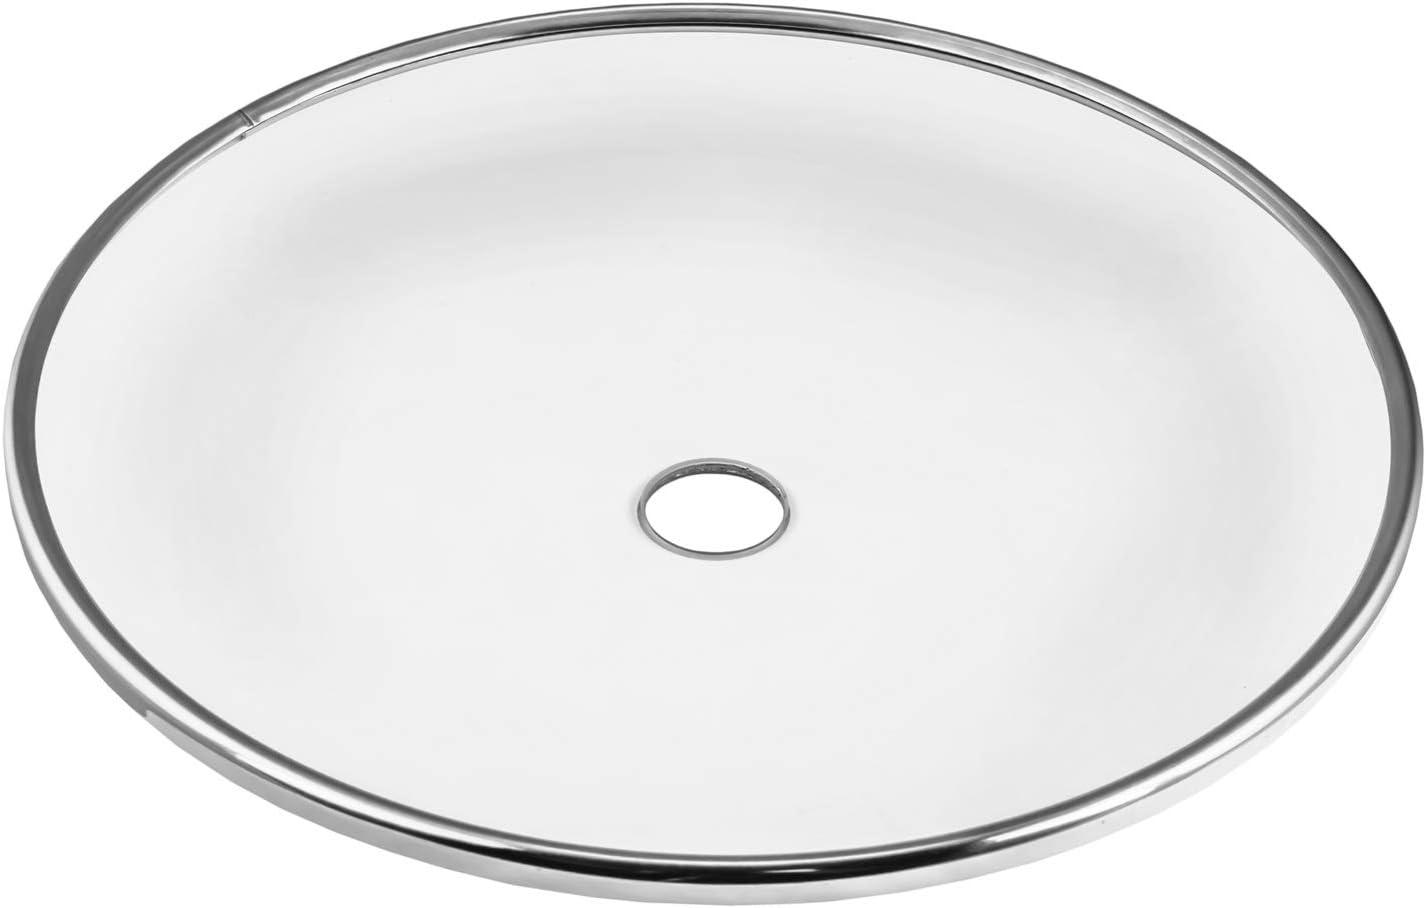 Sultan - Plato de carbón para Shisha (Cristal, Acero Inoxidable V2A, 20 mm, 20 cm, Vidrio de borosilicato)